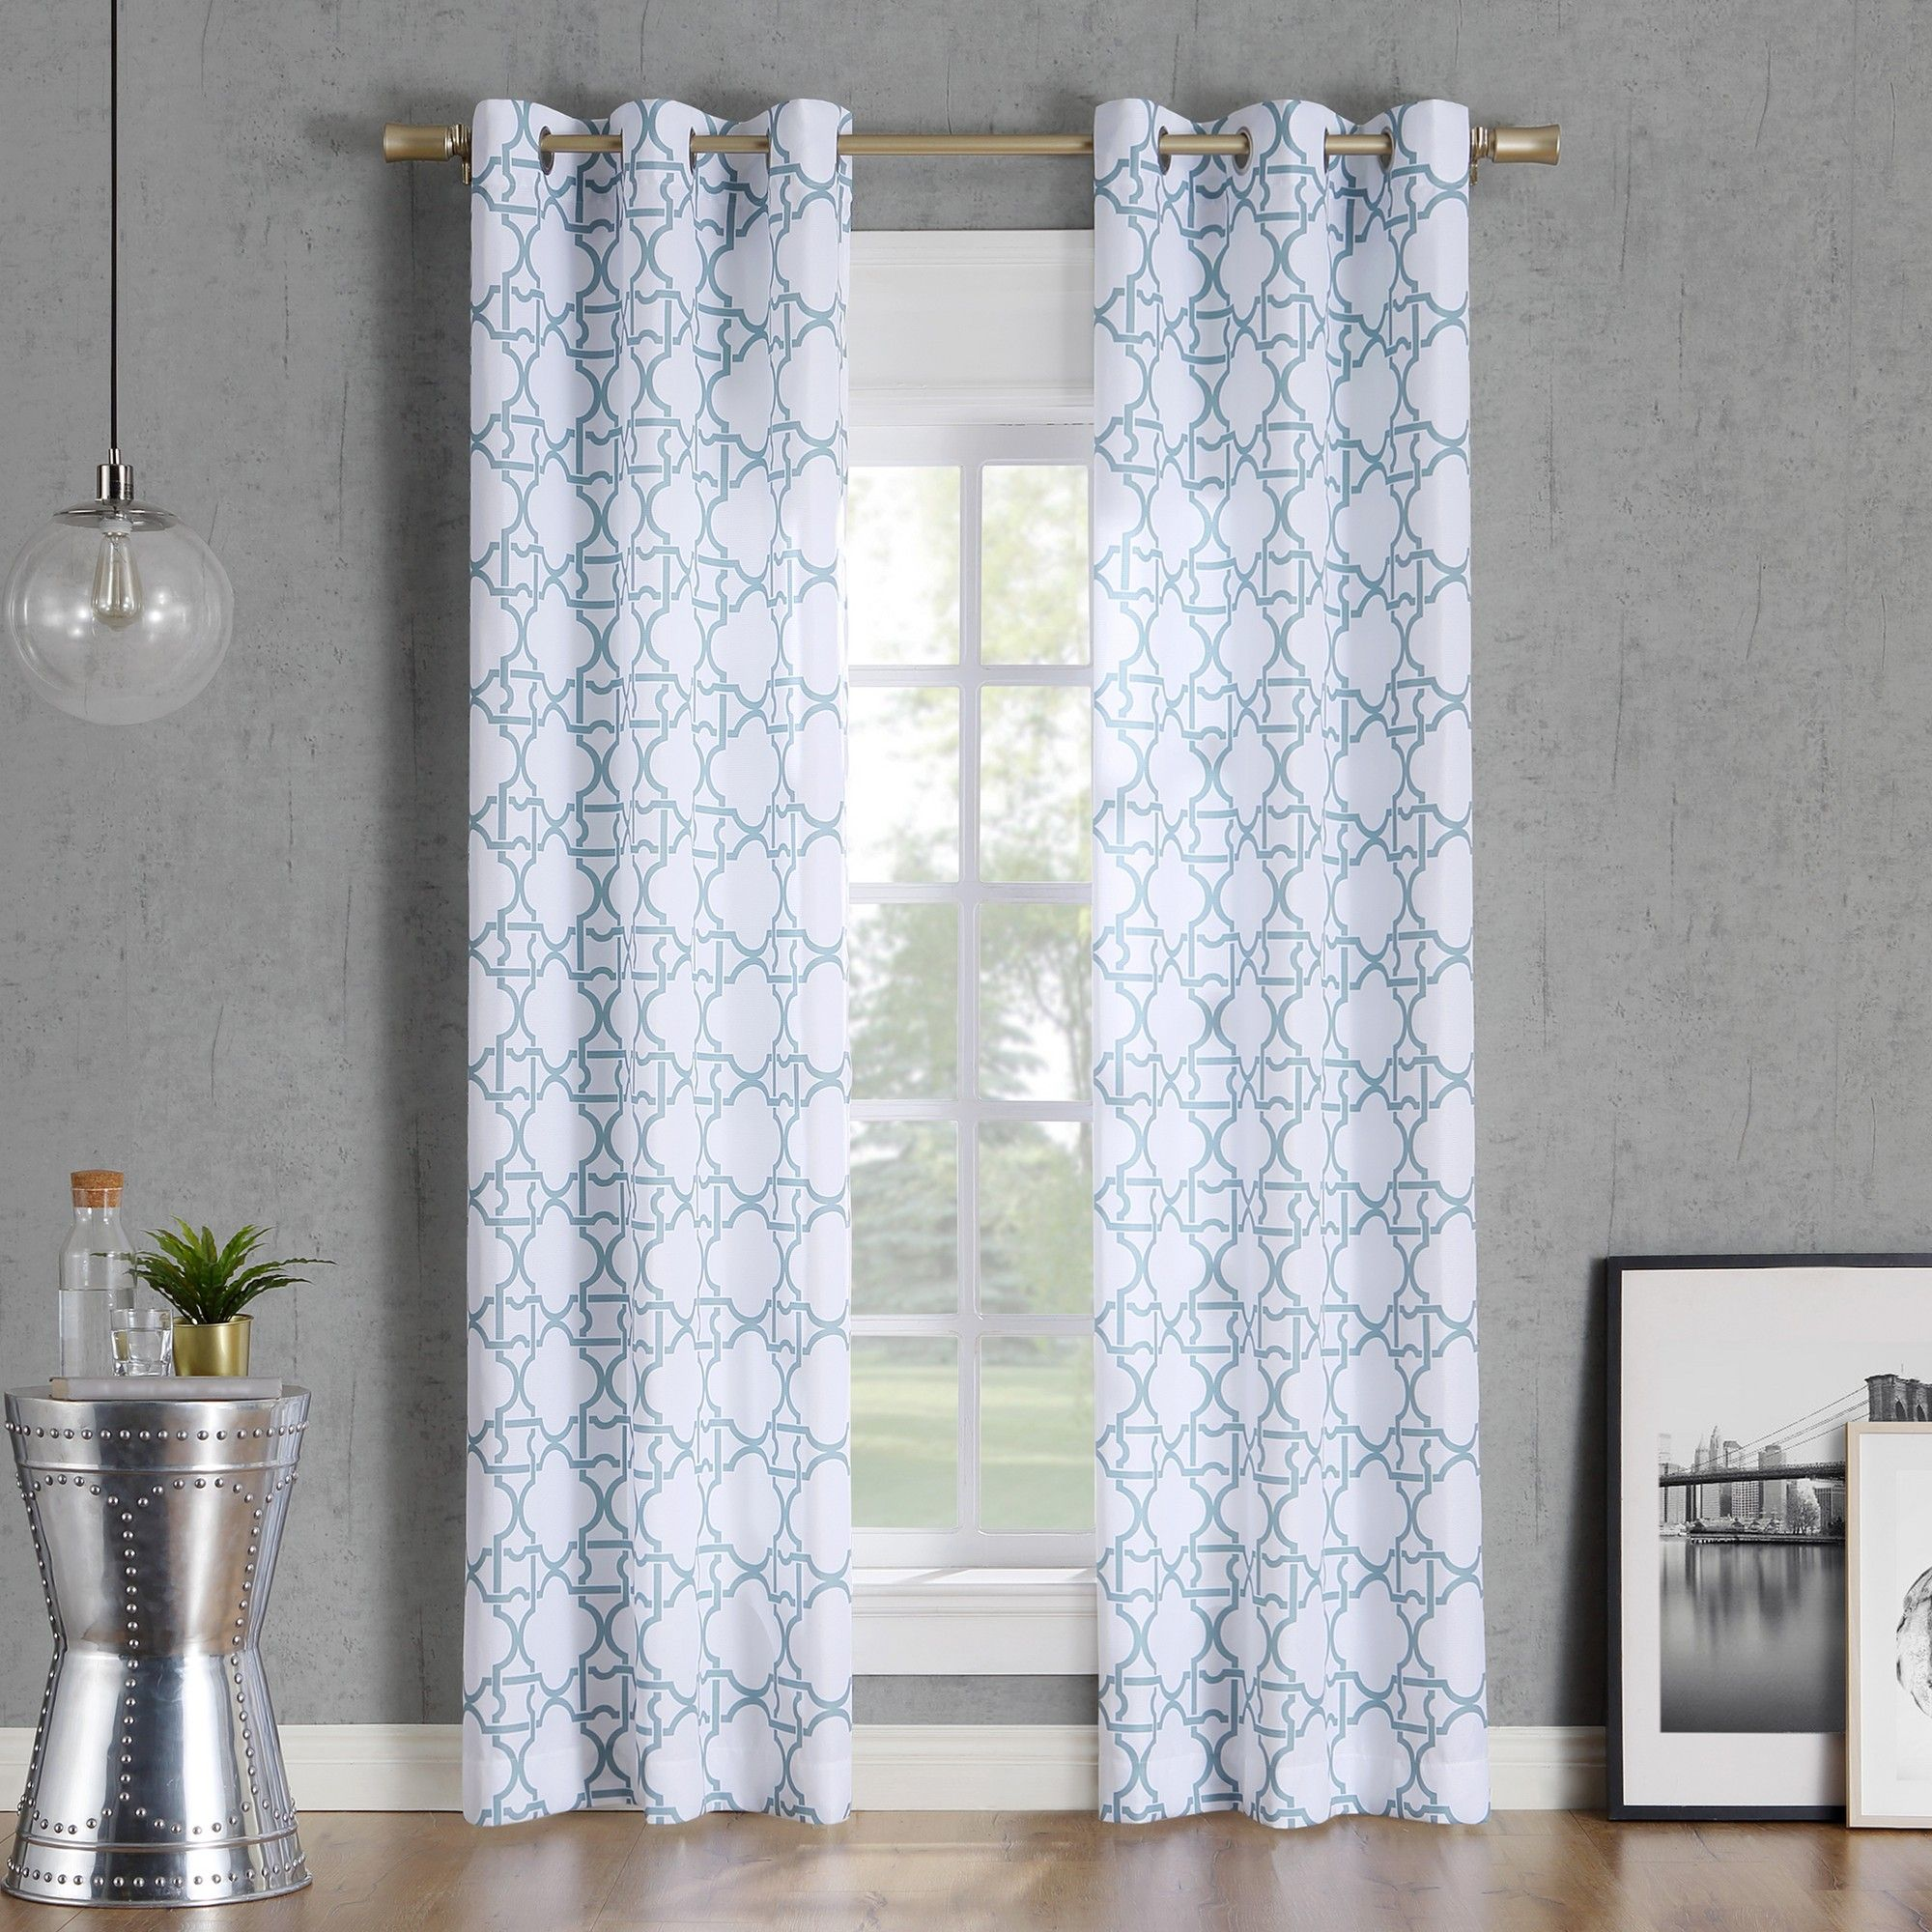 Bed bath and beyond window shades  x barkley trellis semisheer grommet curtain panel aquano